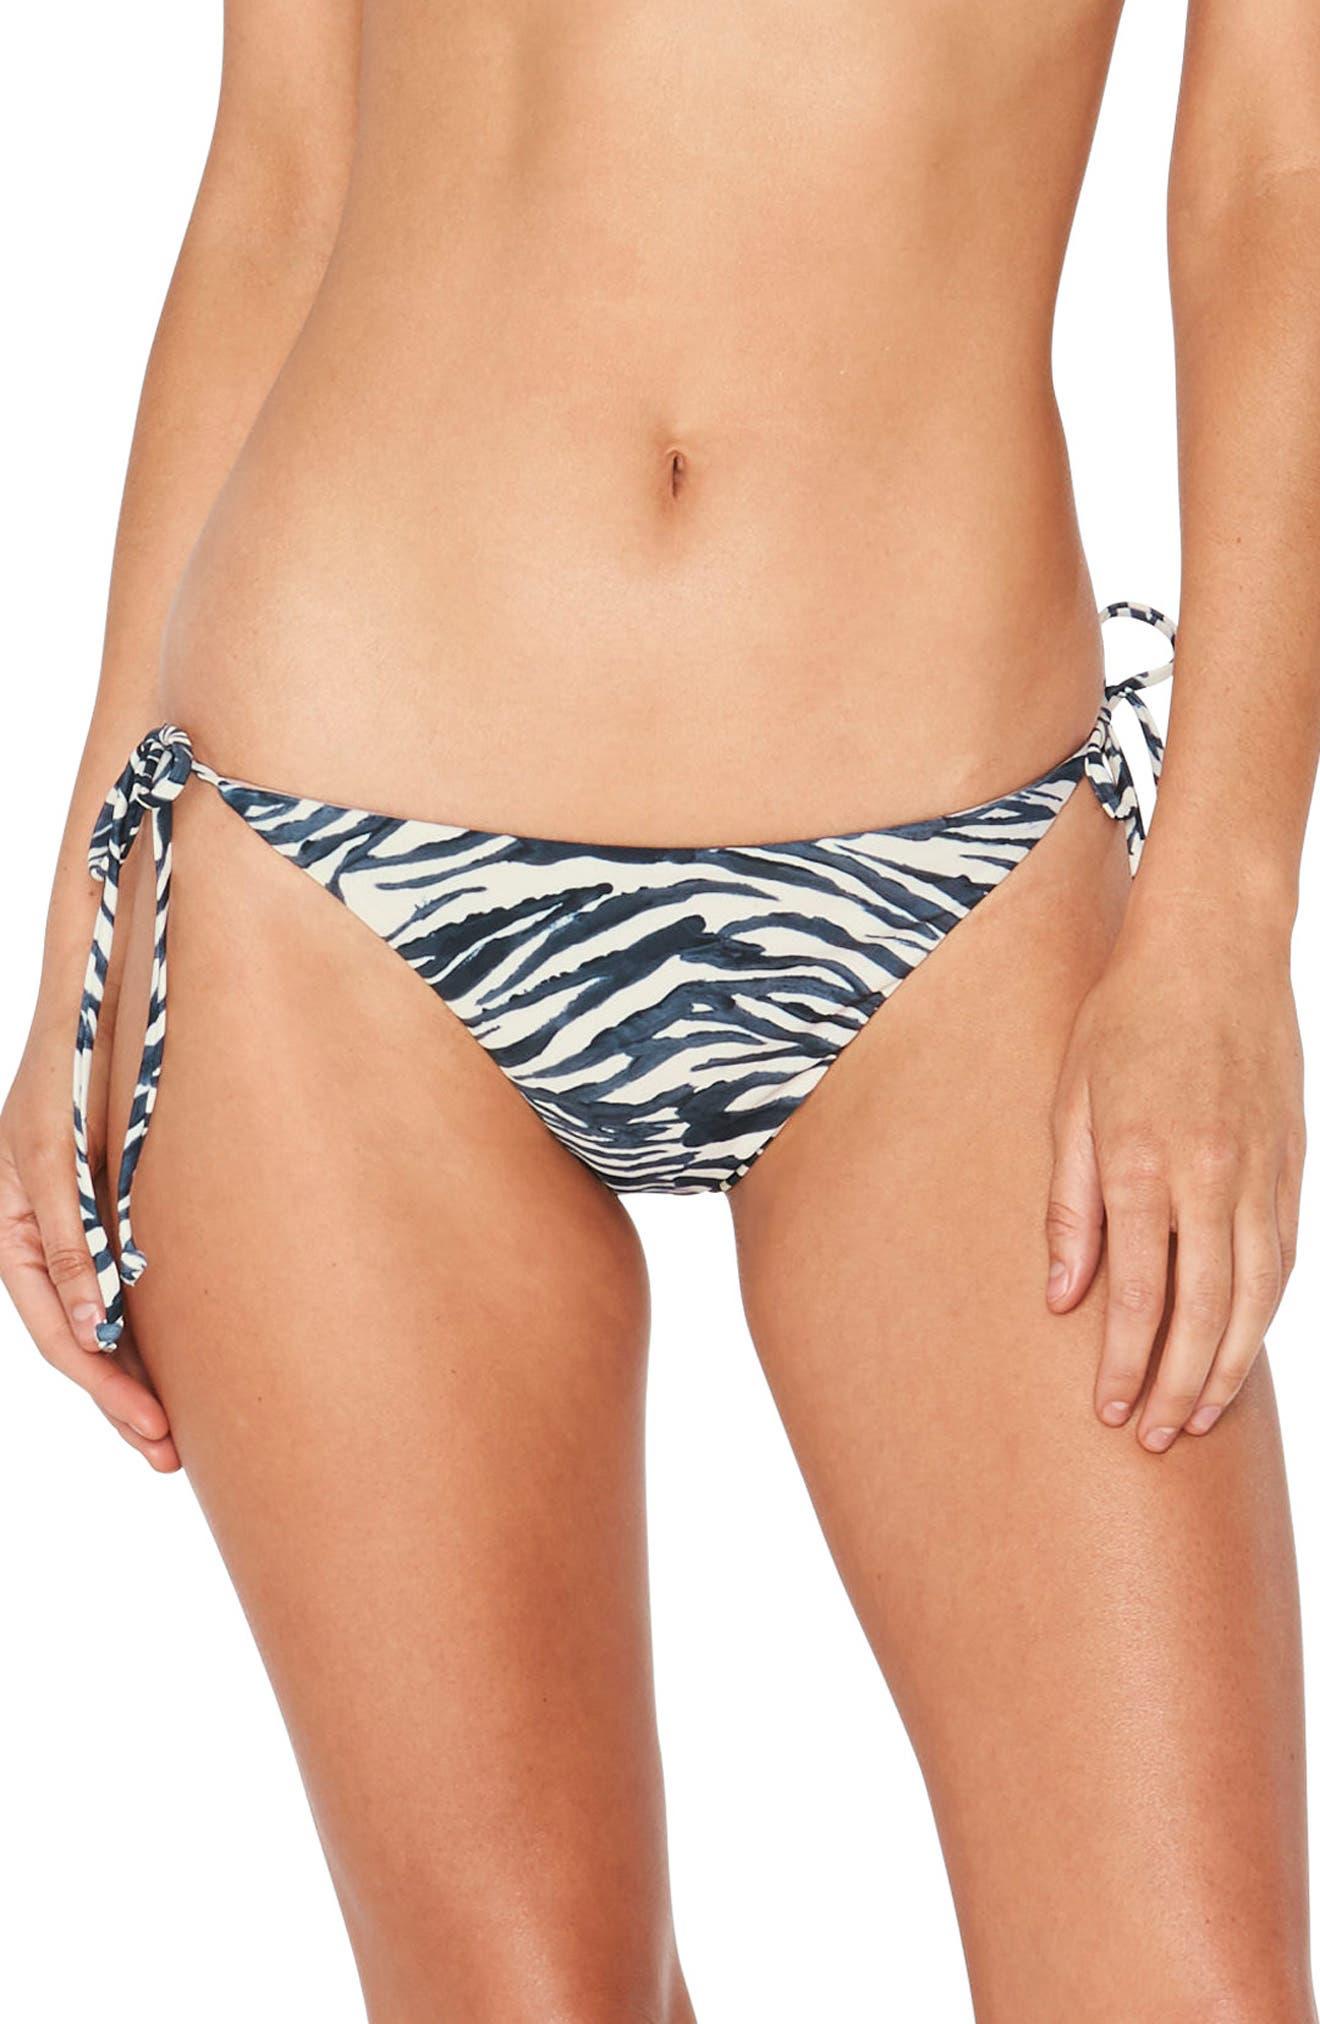 Main Image - L Space Run Wild Lily Reversible Bikini Bottoms